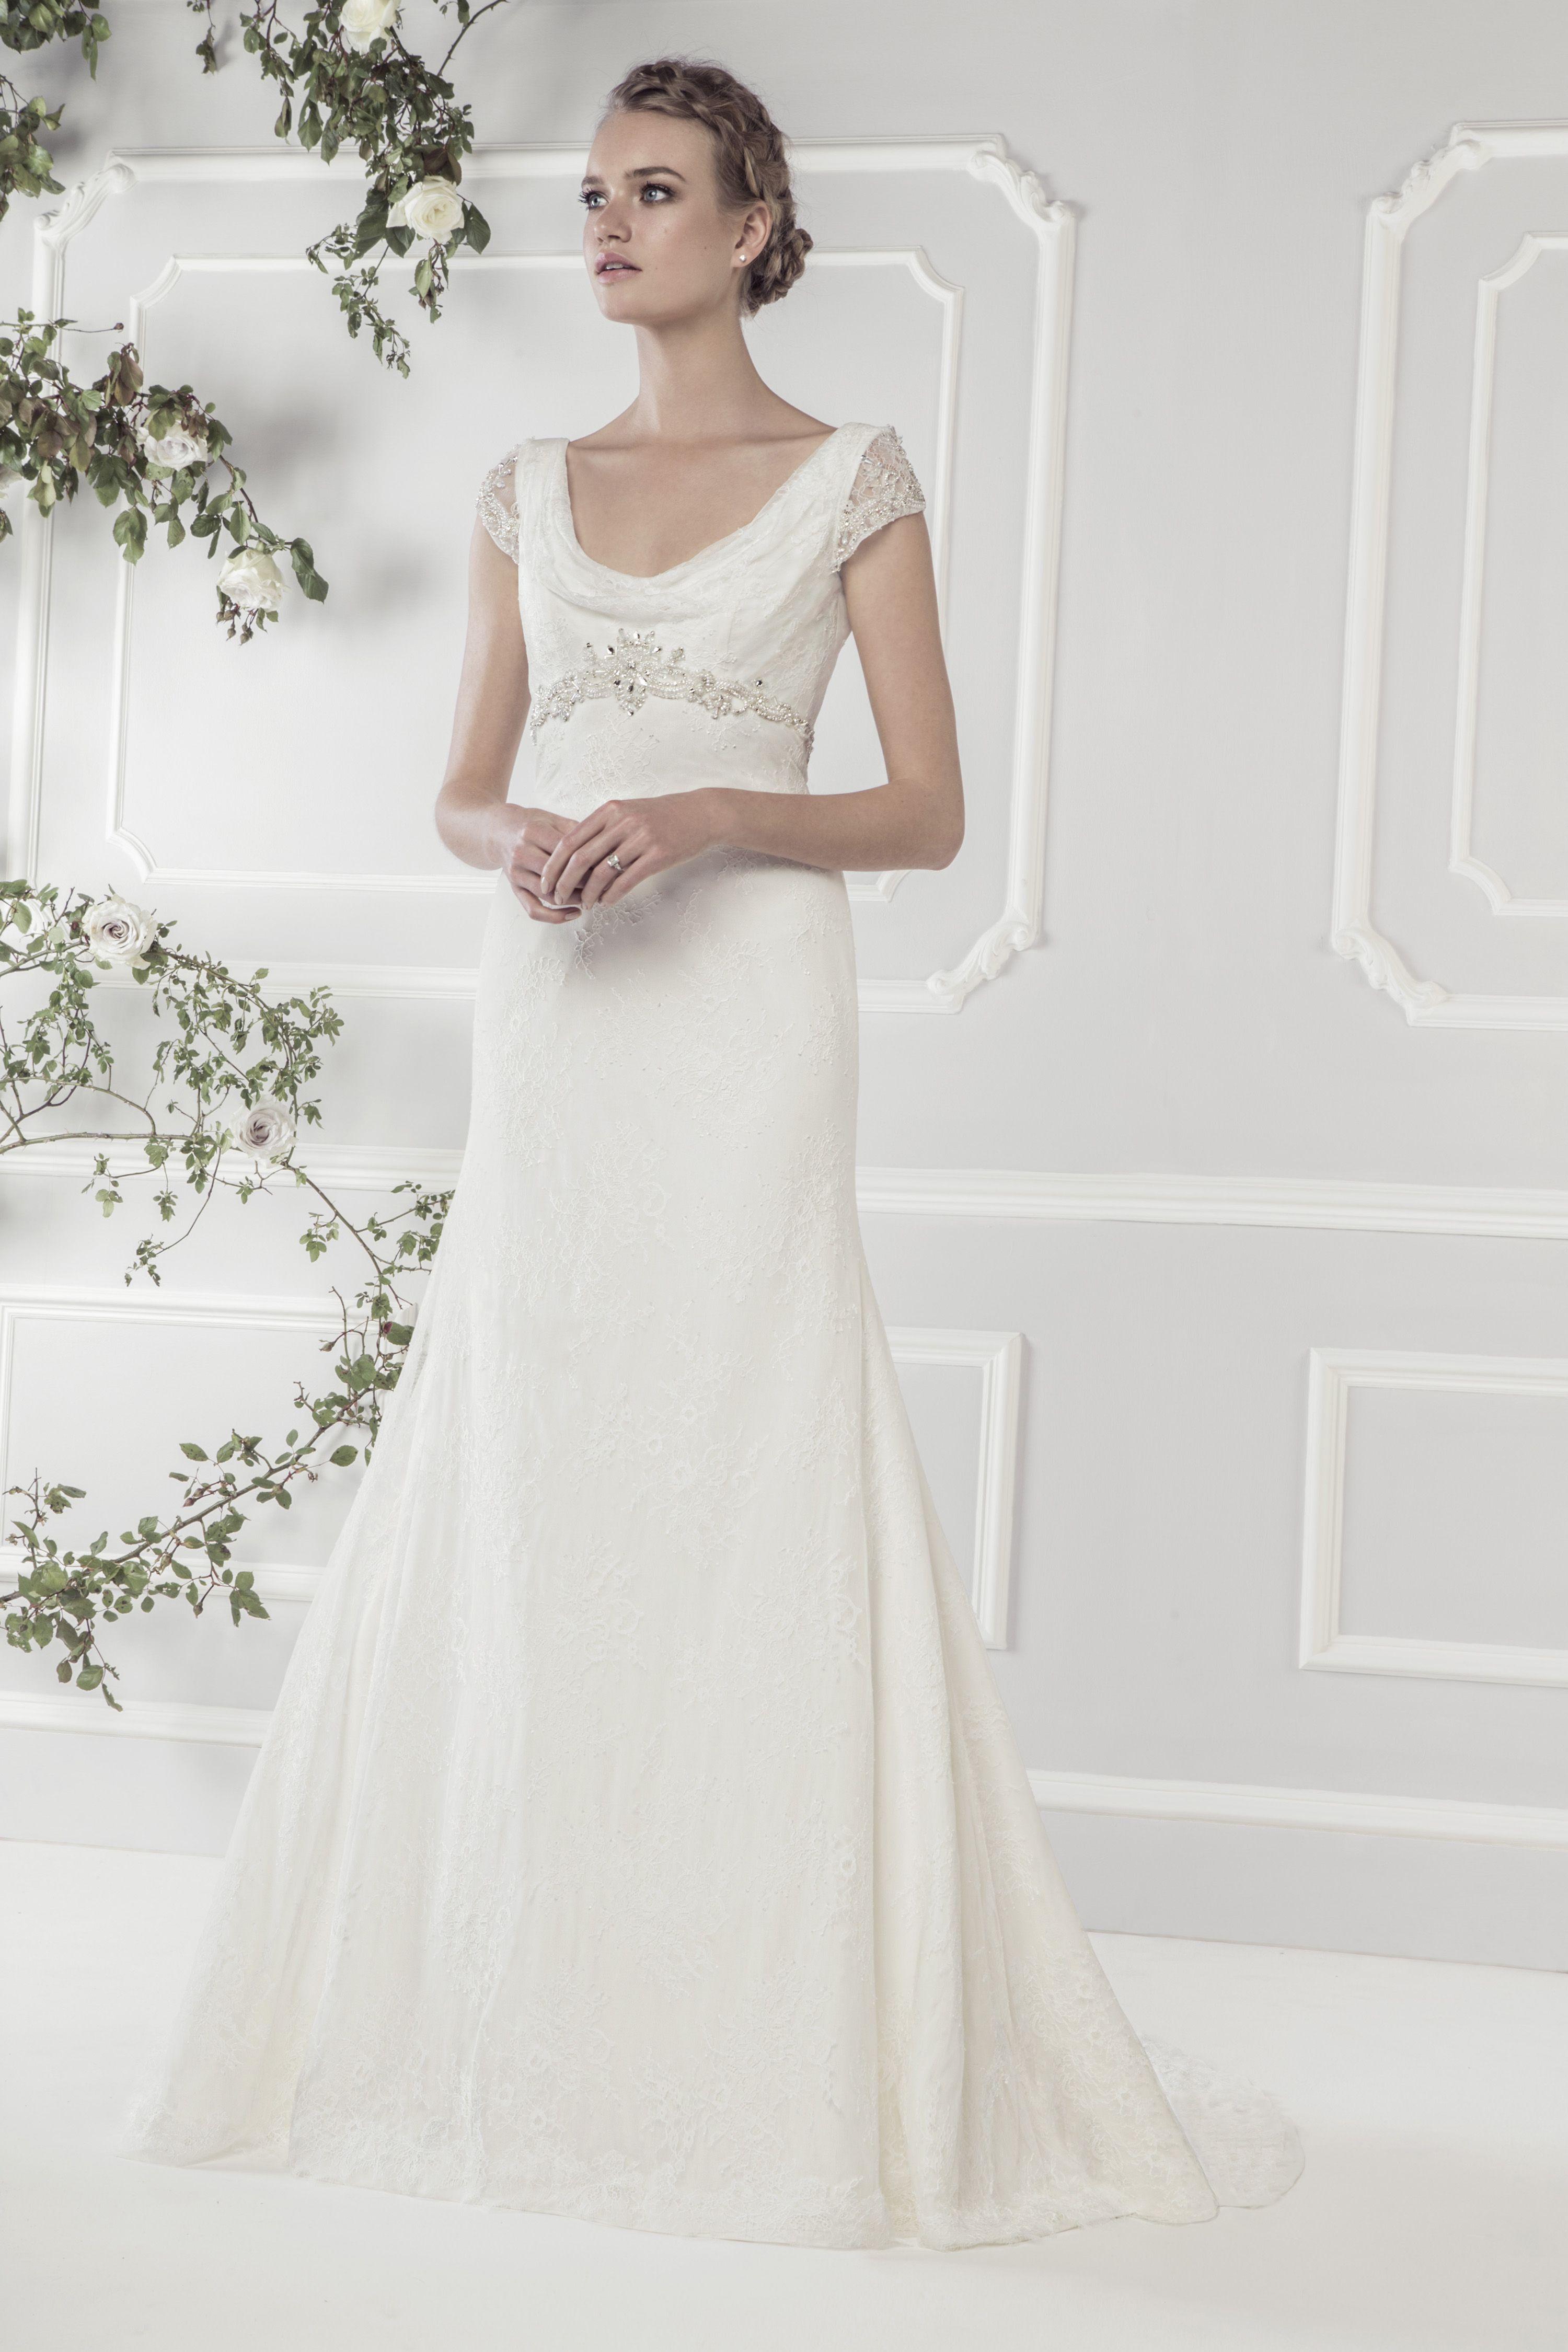 Bellethemagazine wedding dresses   Ellis Bridals Classic Collection   Floor Ivory Mermaid / Trumpet Scoop $$ ($1,001-2,000)